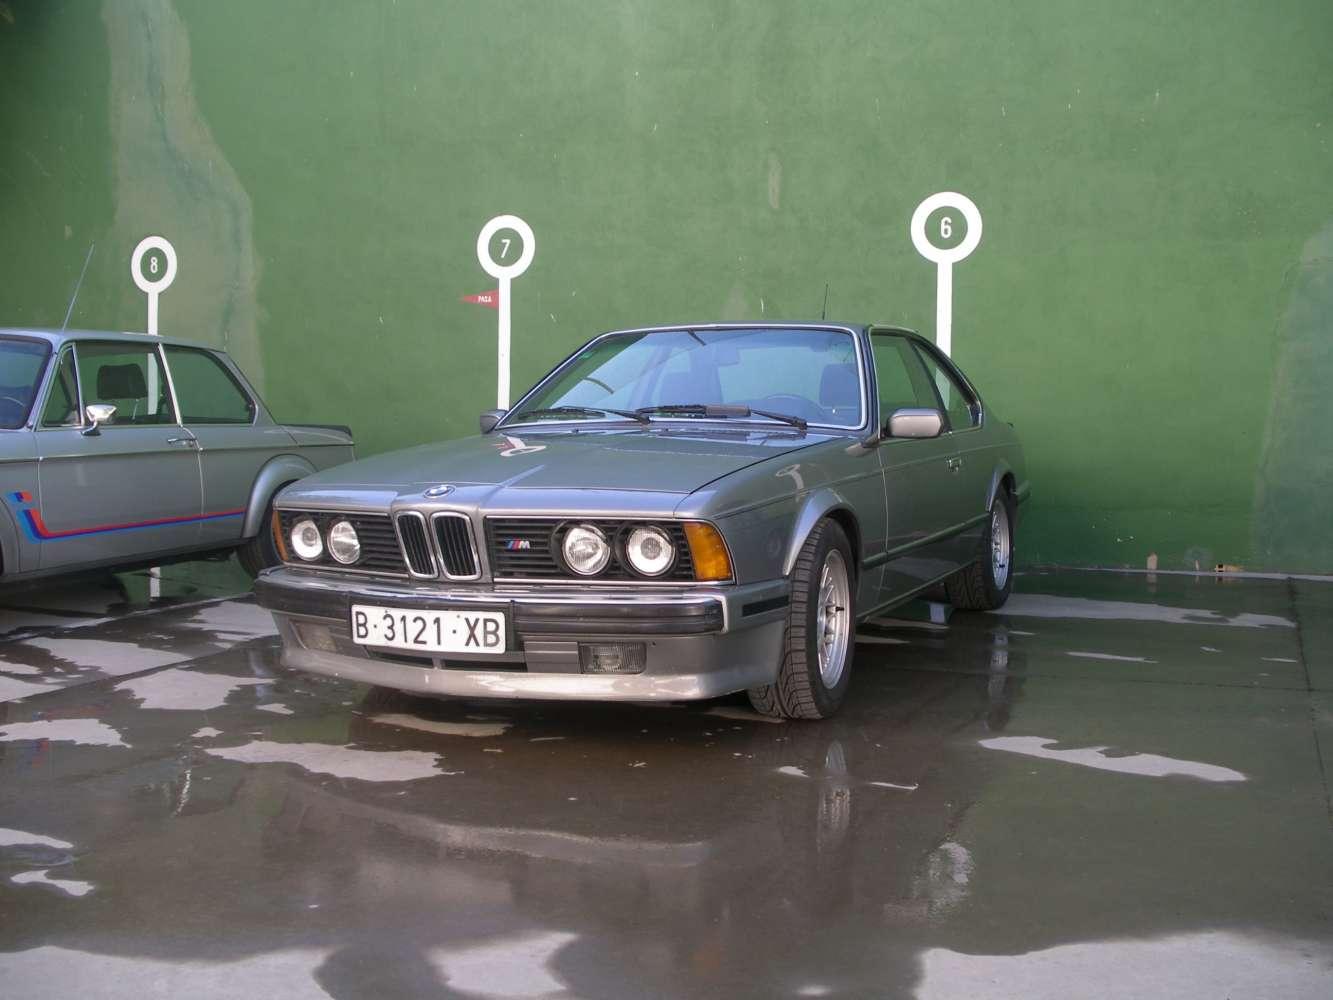 BMW E24 M635csi 118,000 Kms NorClassics Collection